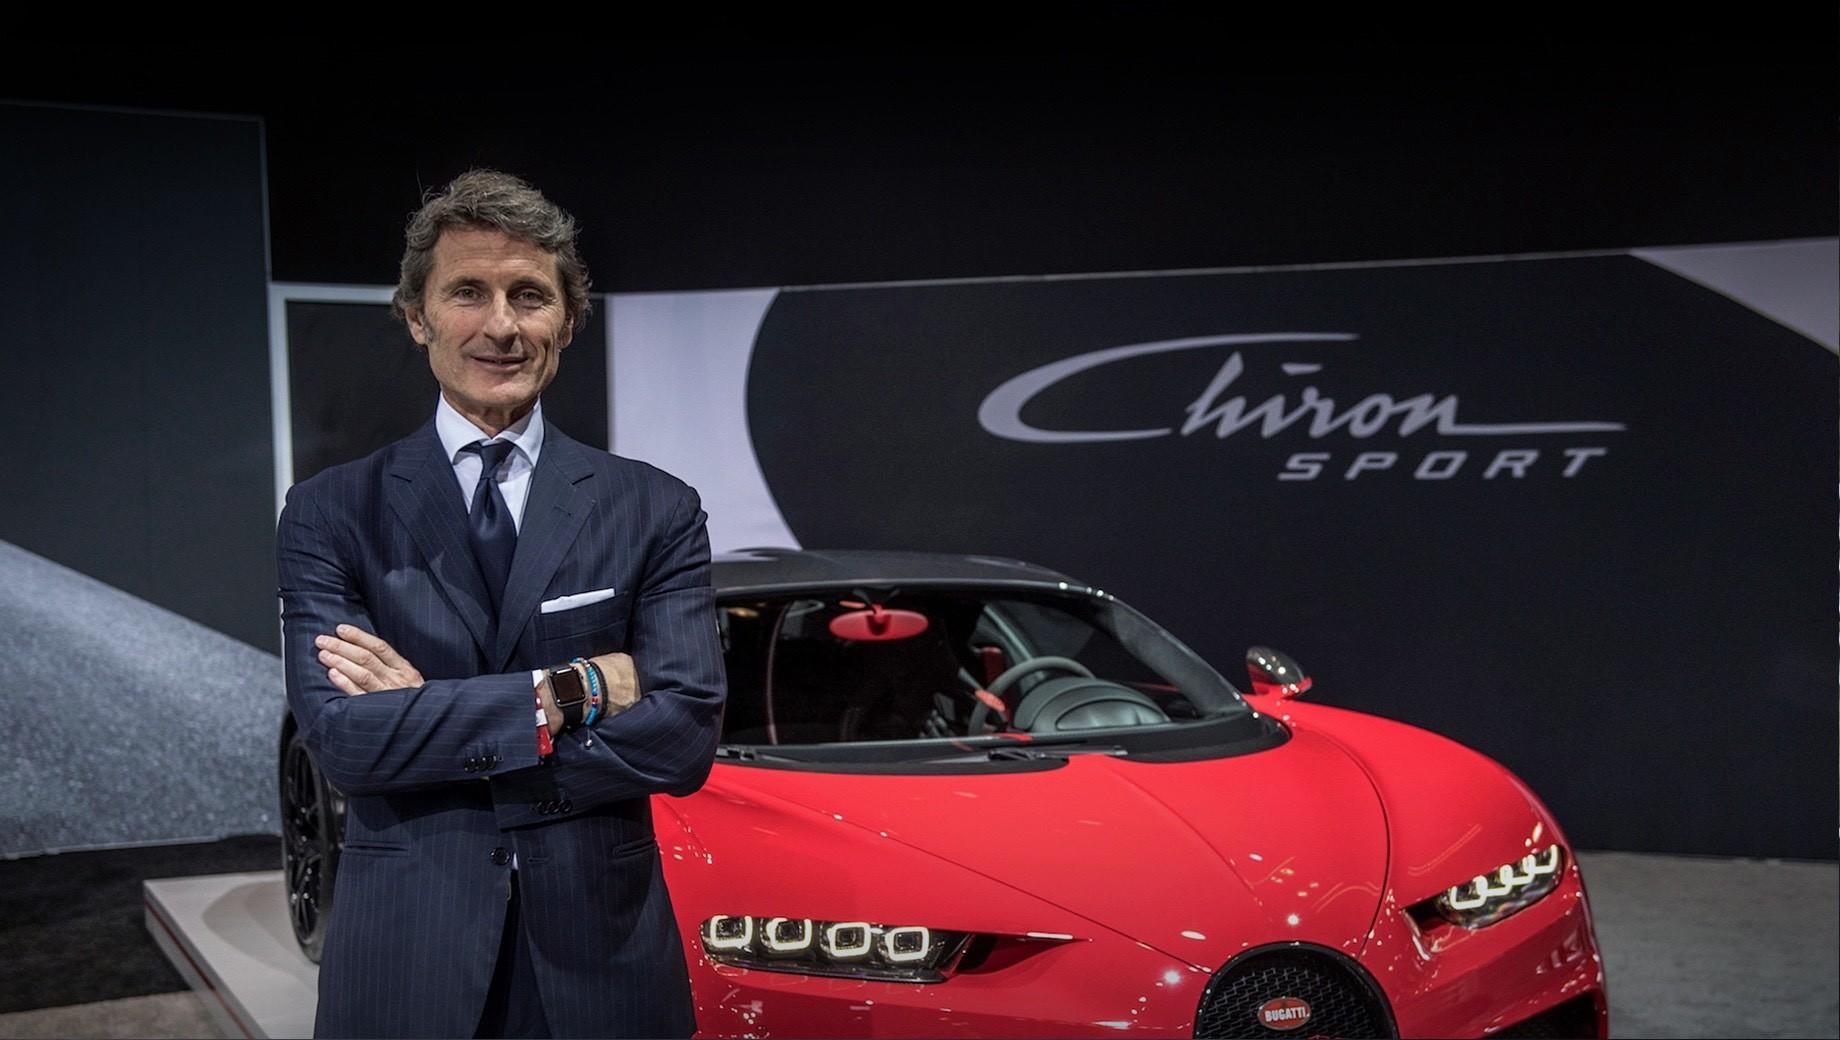 Дополнено: Стефан Винкельман снова возглавит Lamborghini